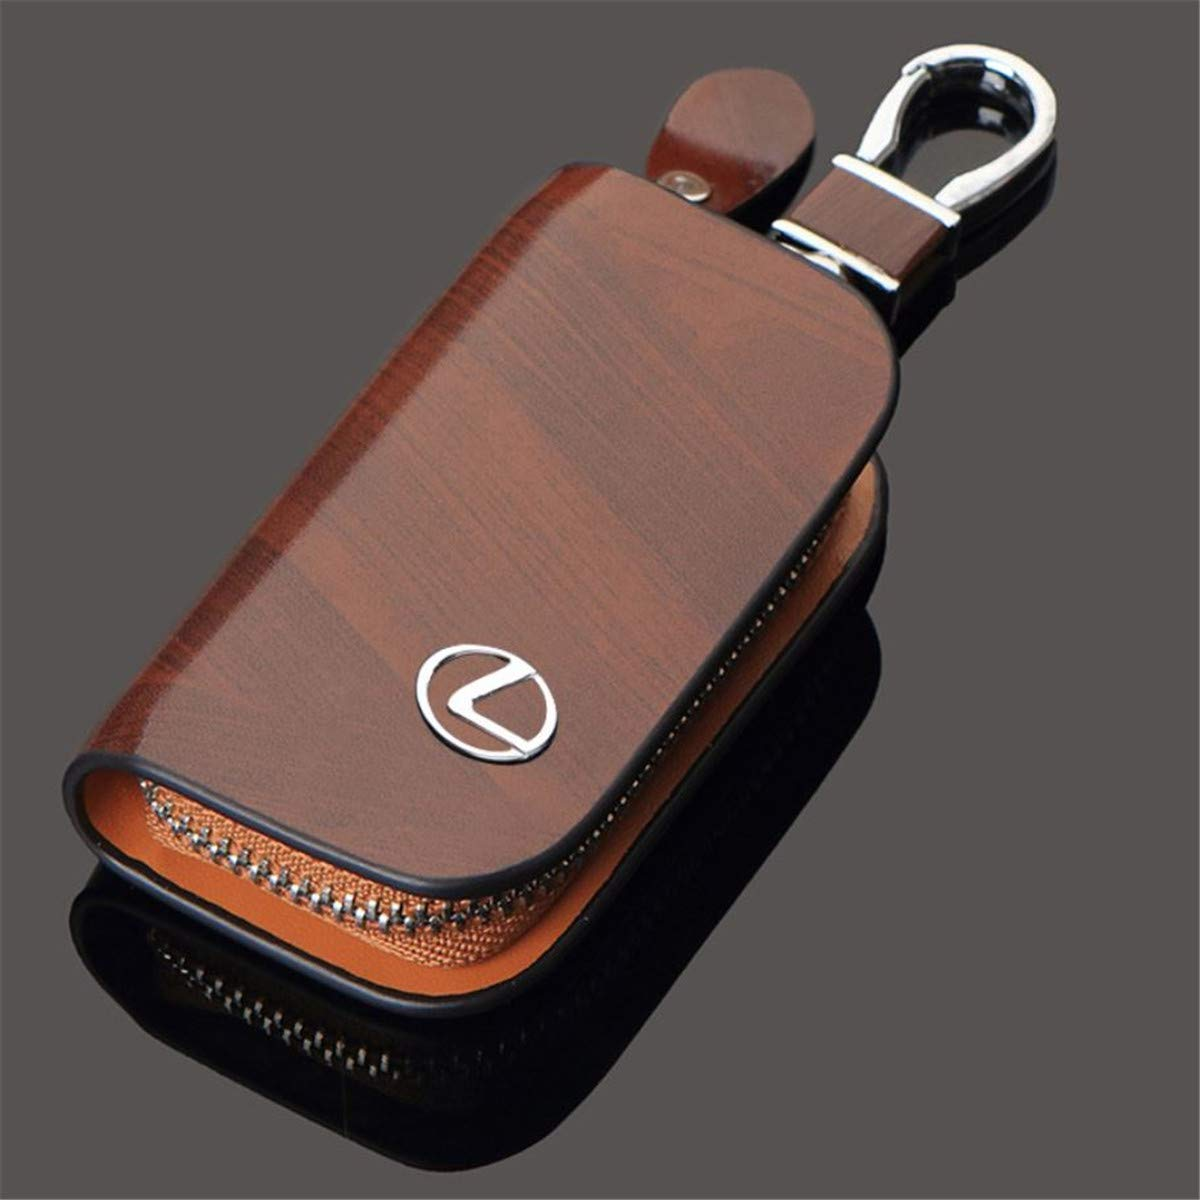 Lexus Logo Leather Key Bag,Mens Retro Cowhide Key Bag.Zinc Alloy Material.Electroplating Process high Gloss polishing.Brown Color. zinc Alloy Material Bright Color